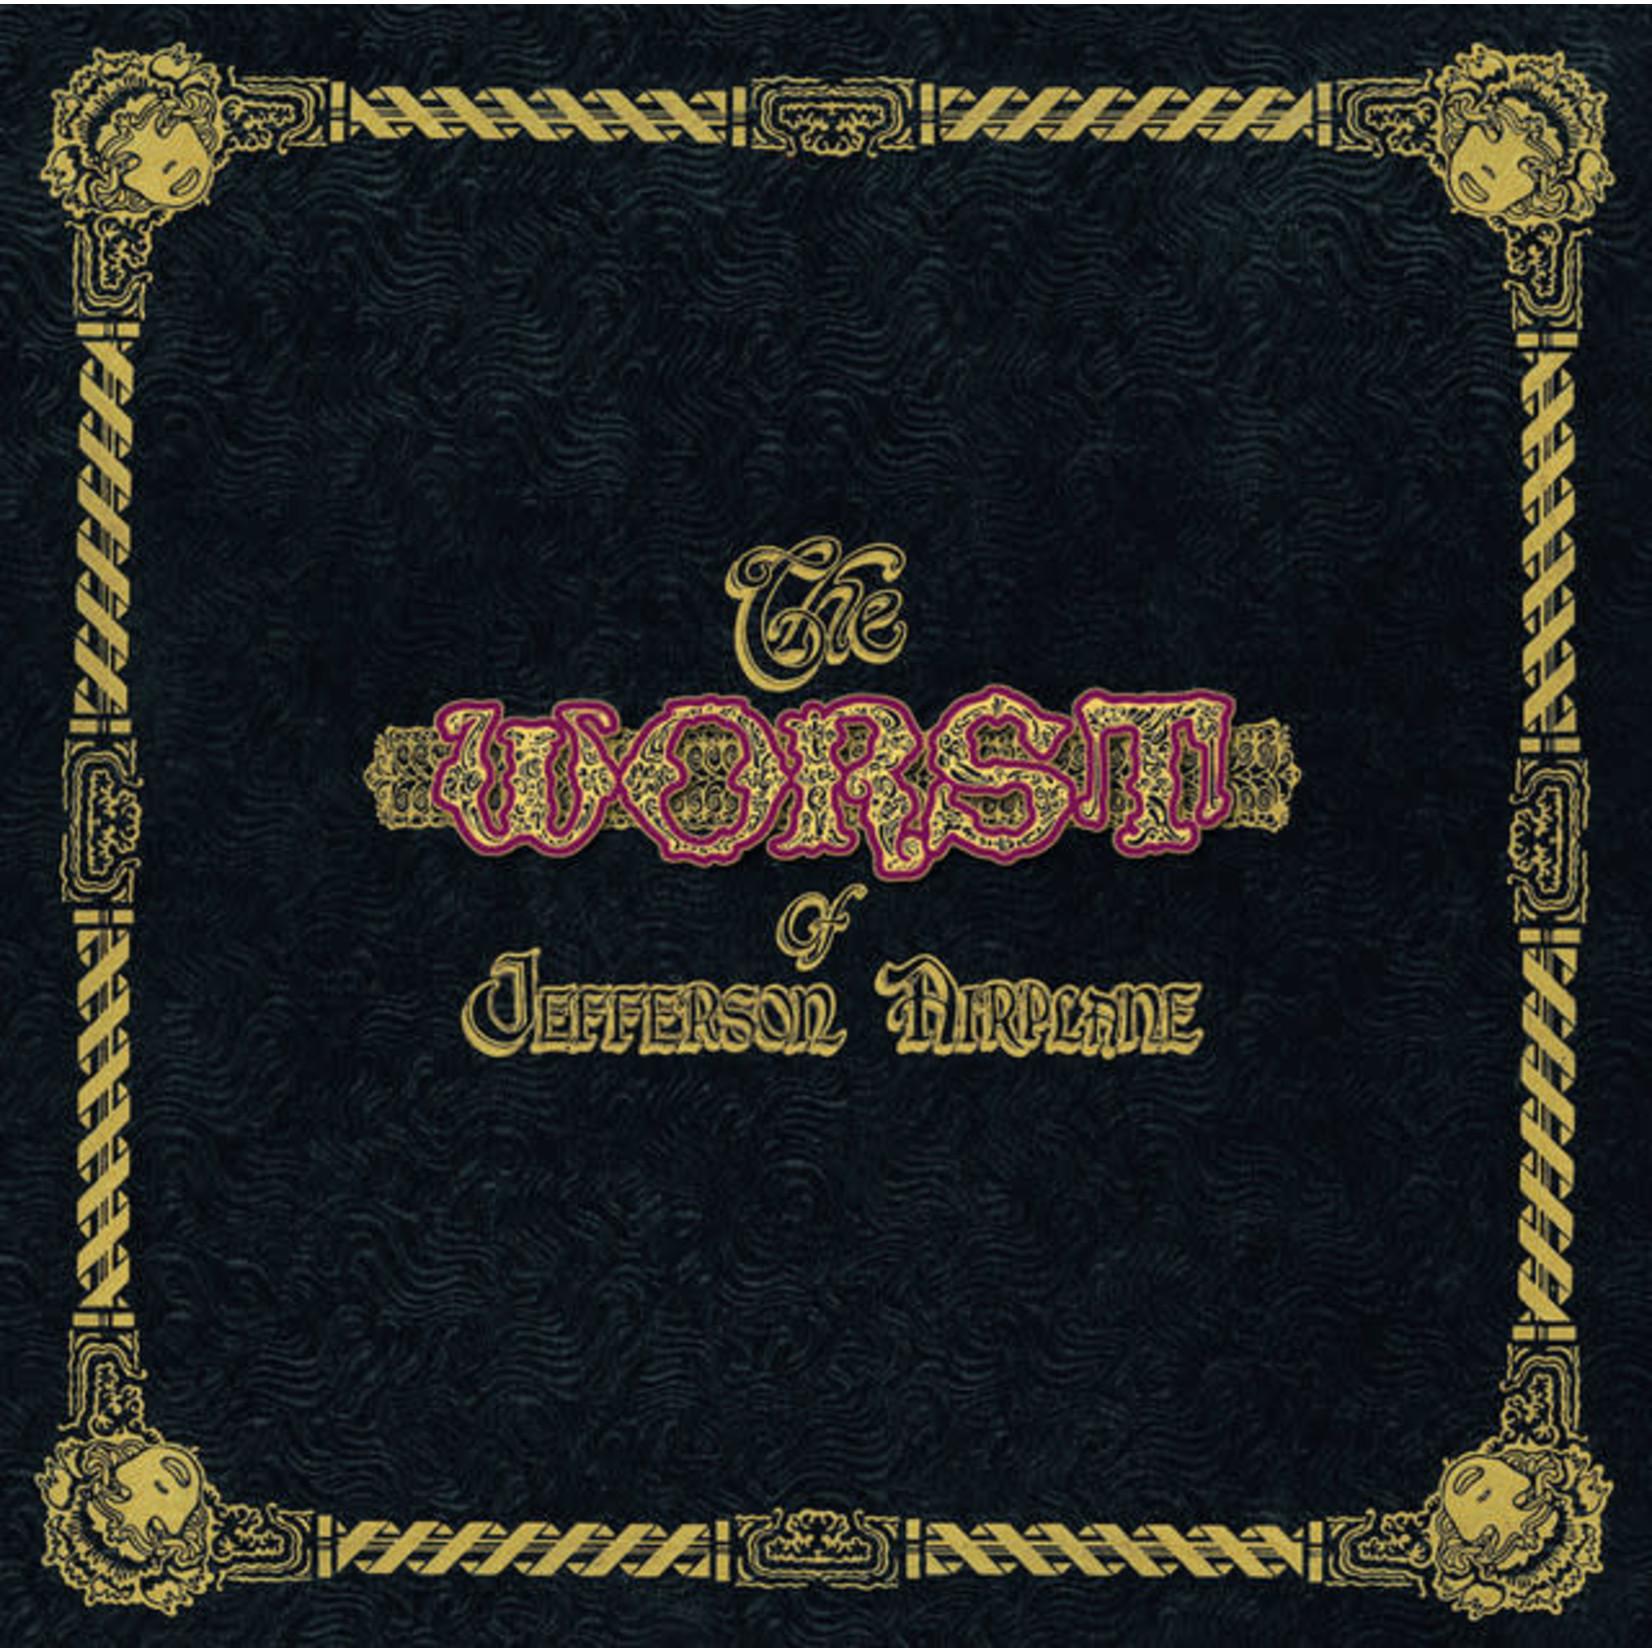 Vinyl Jefferson Airplane - The Worst Of Jefferson Airplane